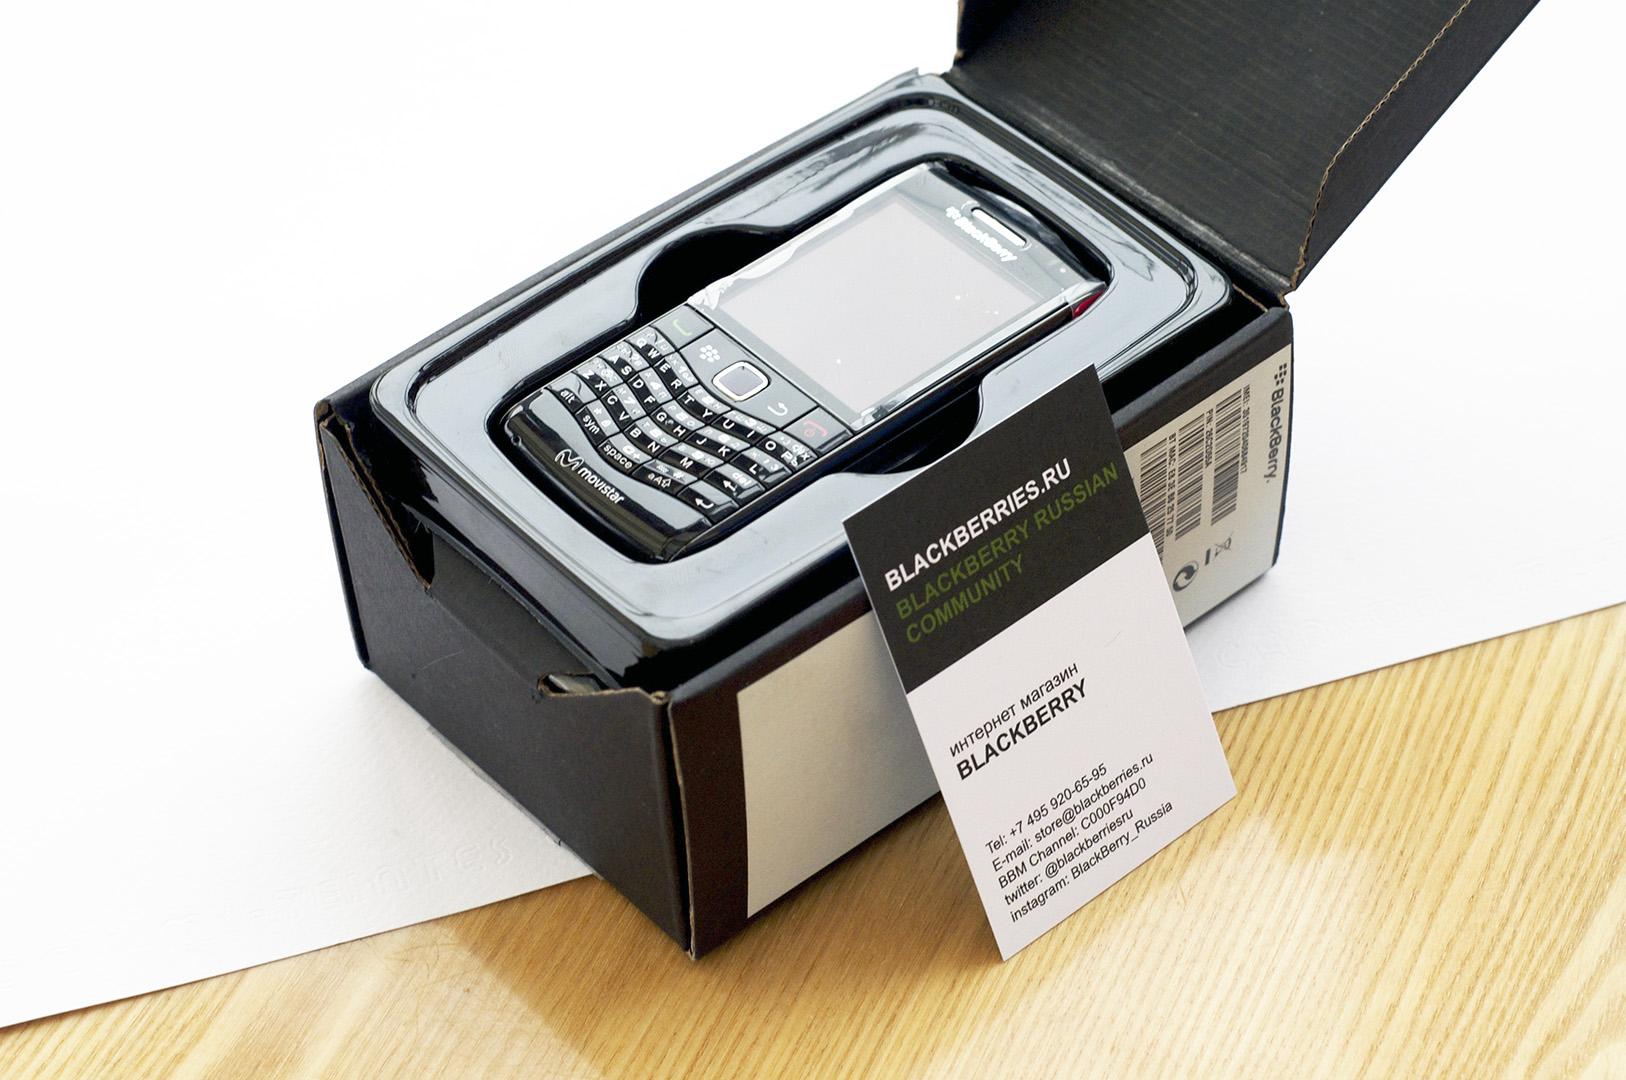 blackberry-9100-pearl-3g-01